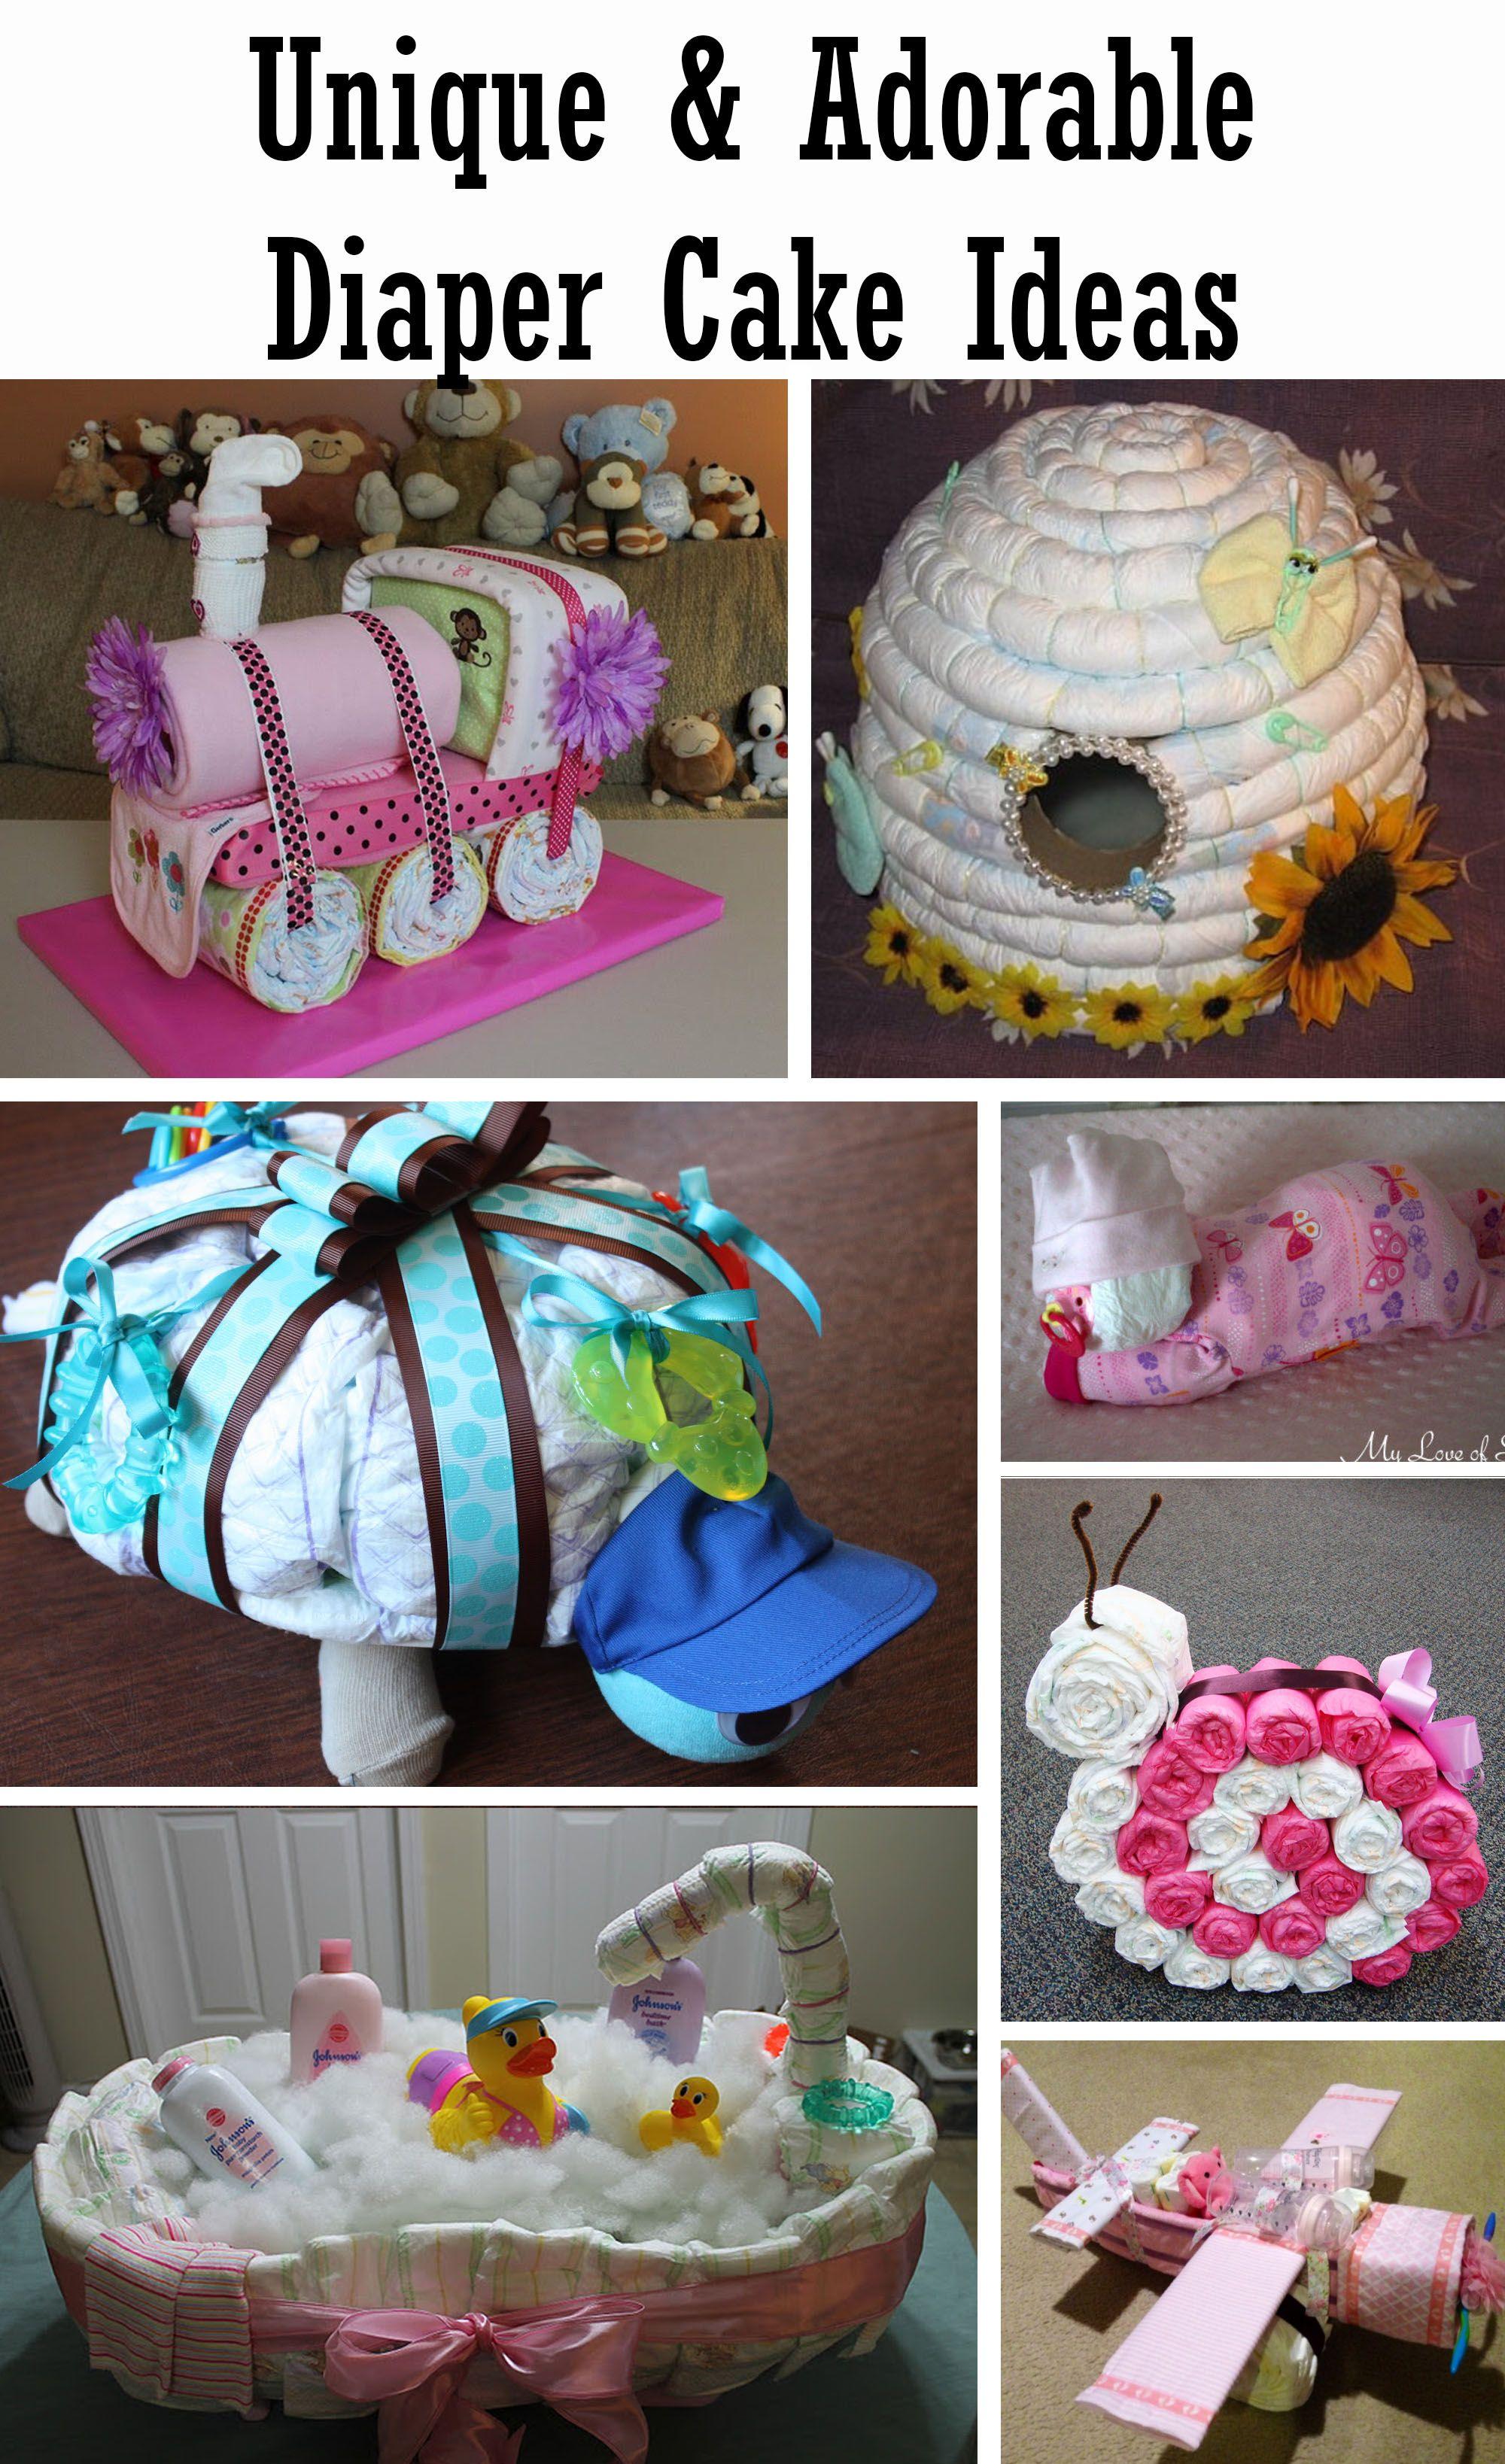 Adorable Diaper Cake Ideas Diaper Cakes Diaper Cake